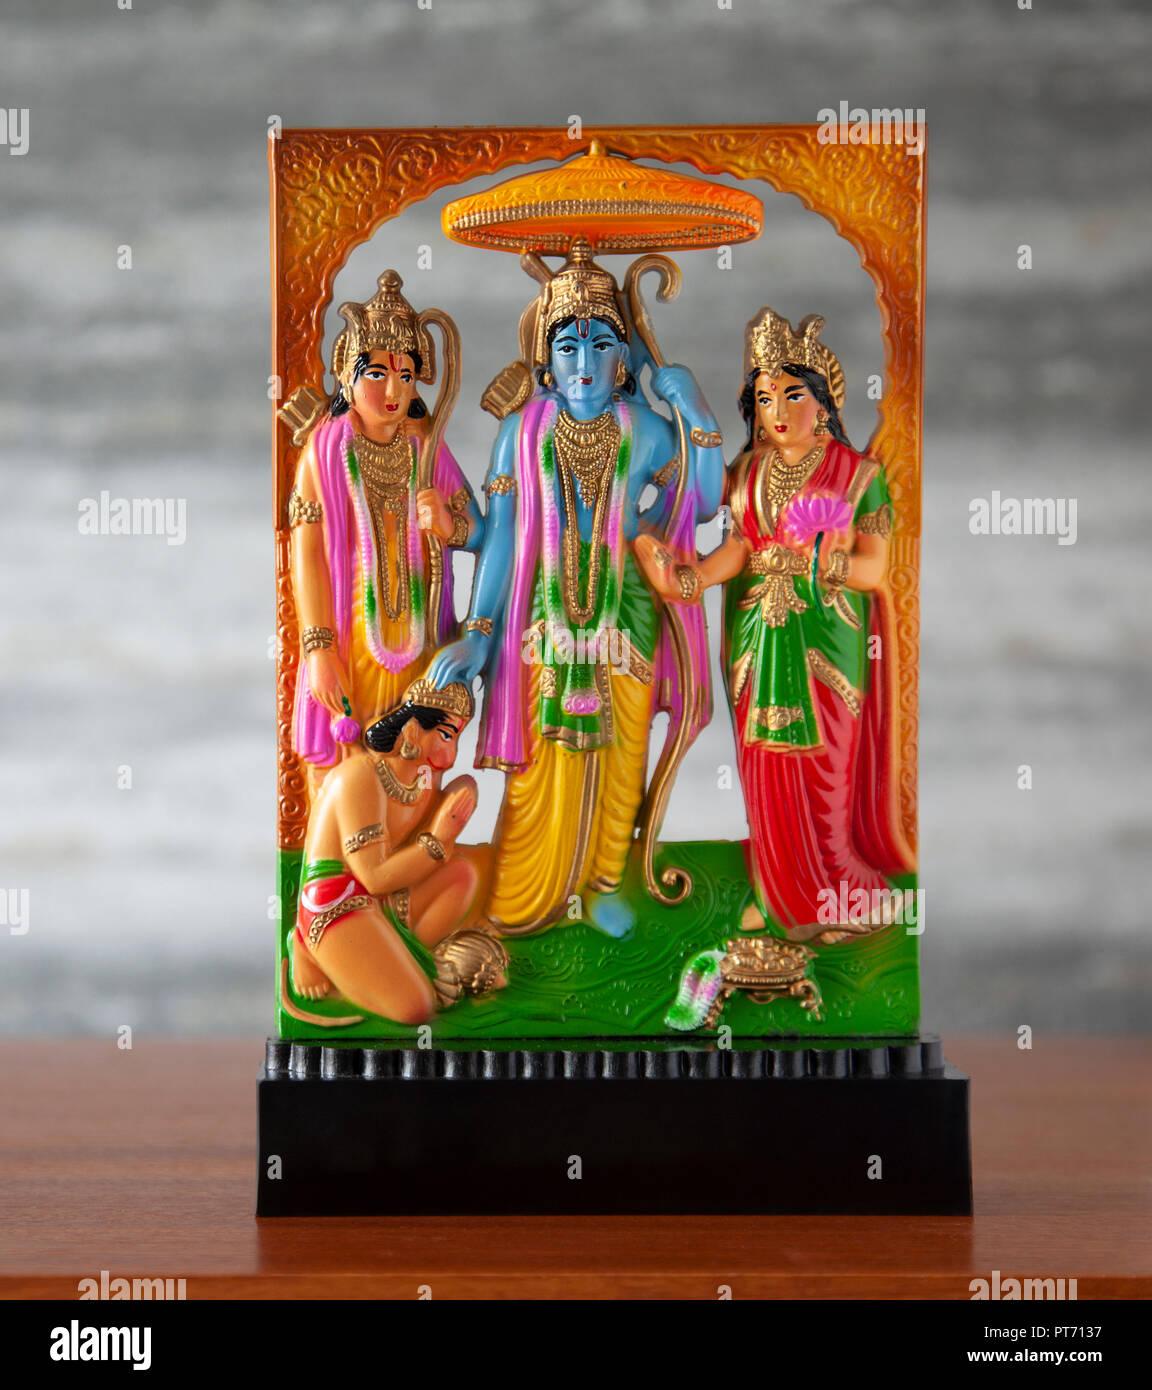 Small moulded plastic, standalone Ram Darbar sculpture, a Hindu religious artefact with Sri Ram, Sita, Lakshman and Hanuman the monkey god. Ramayana, - Stock Image